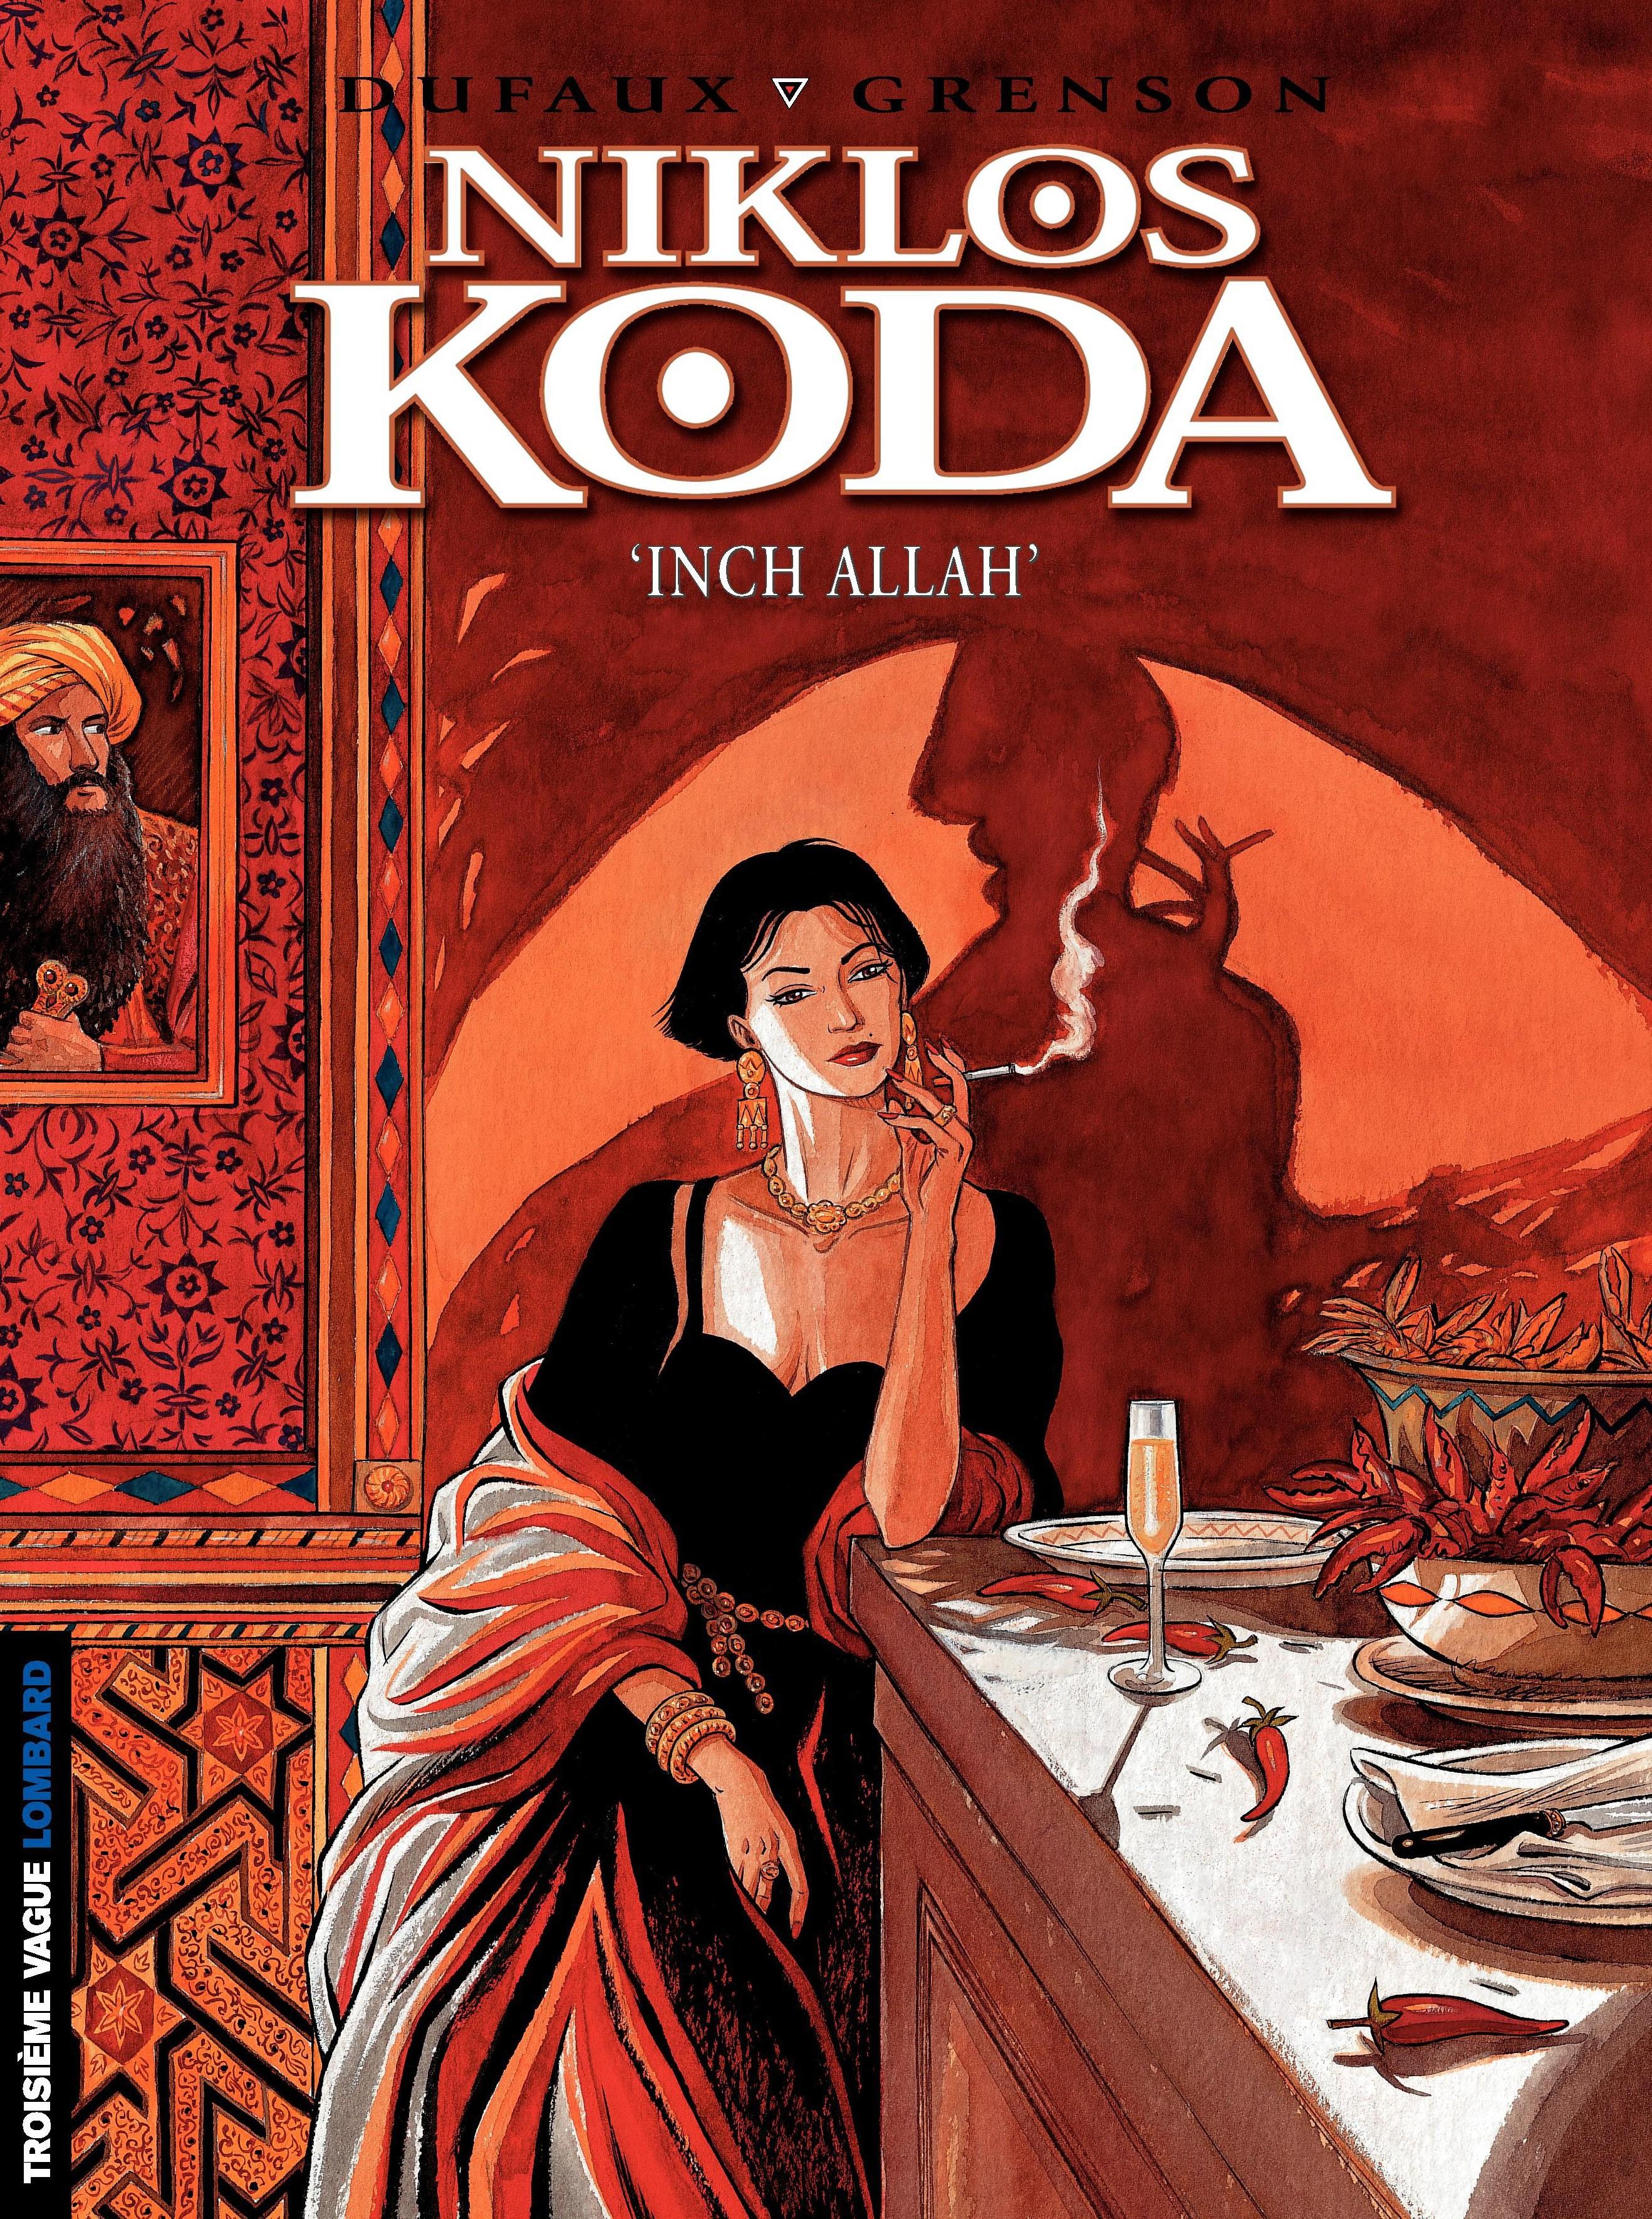 Niklos Koda – tome 3 - 'Inch Allah'